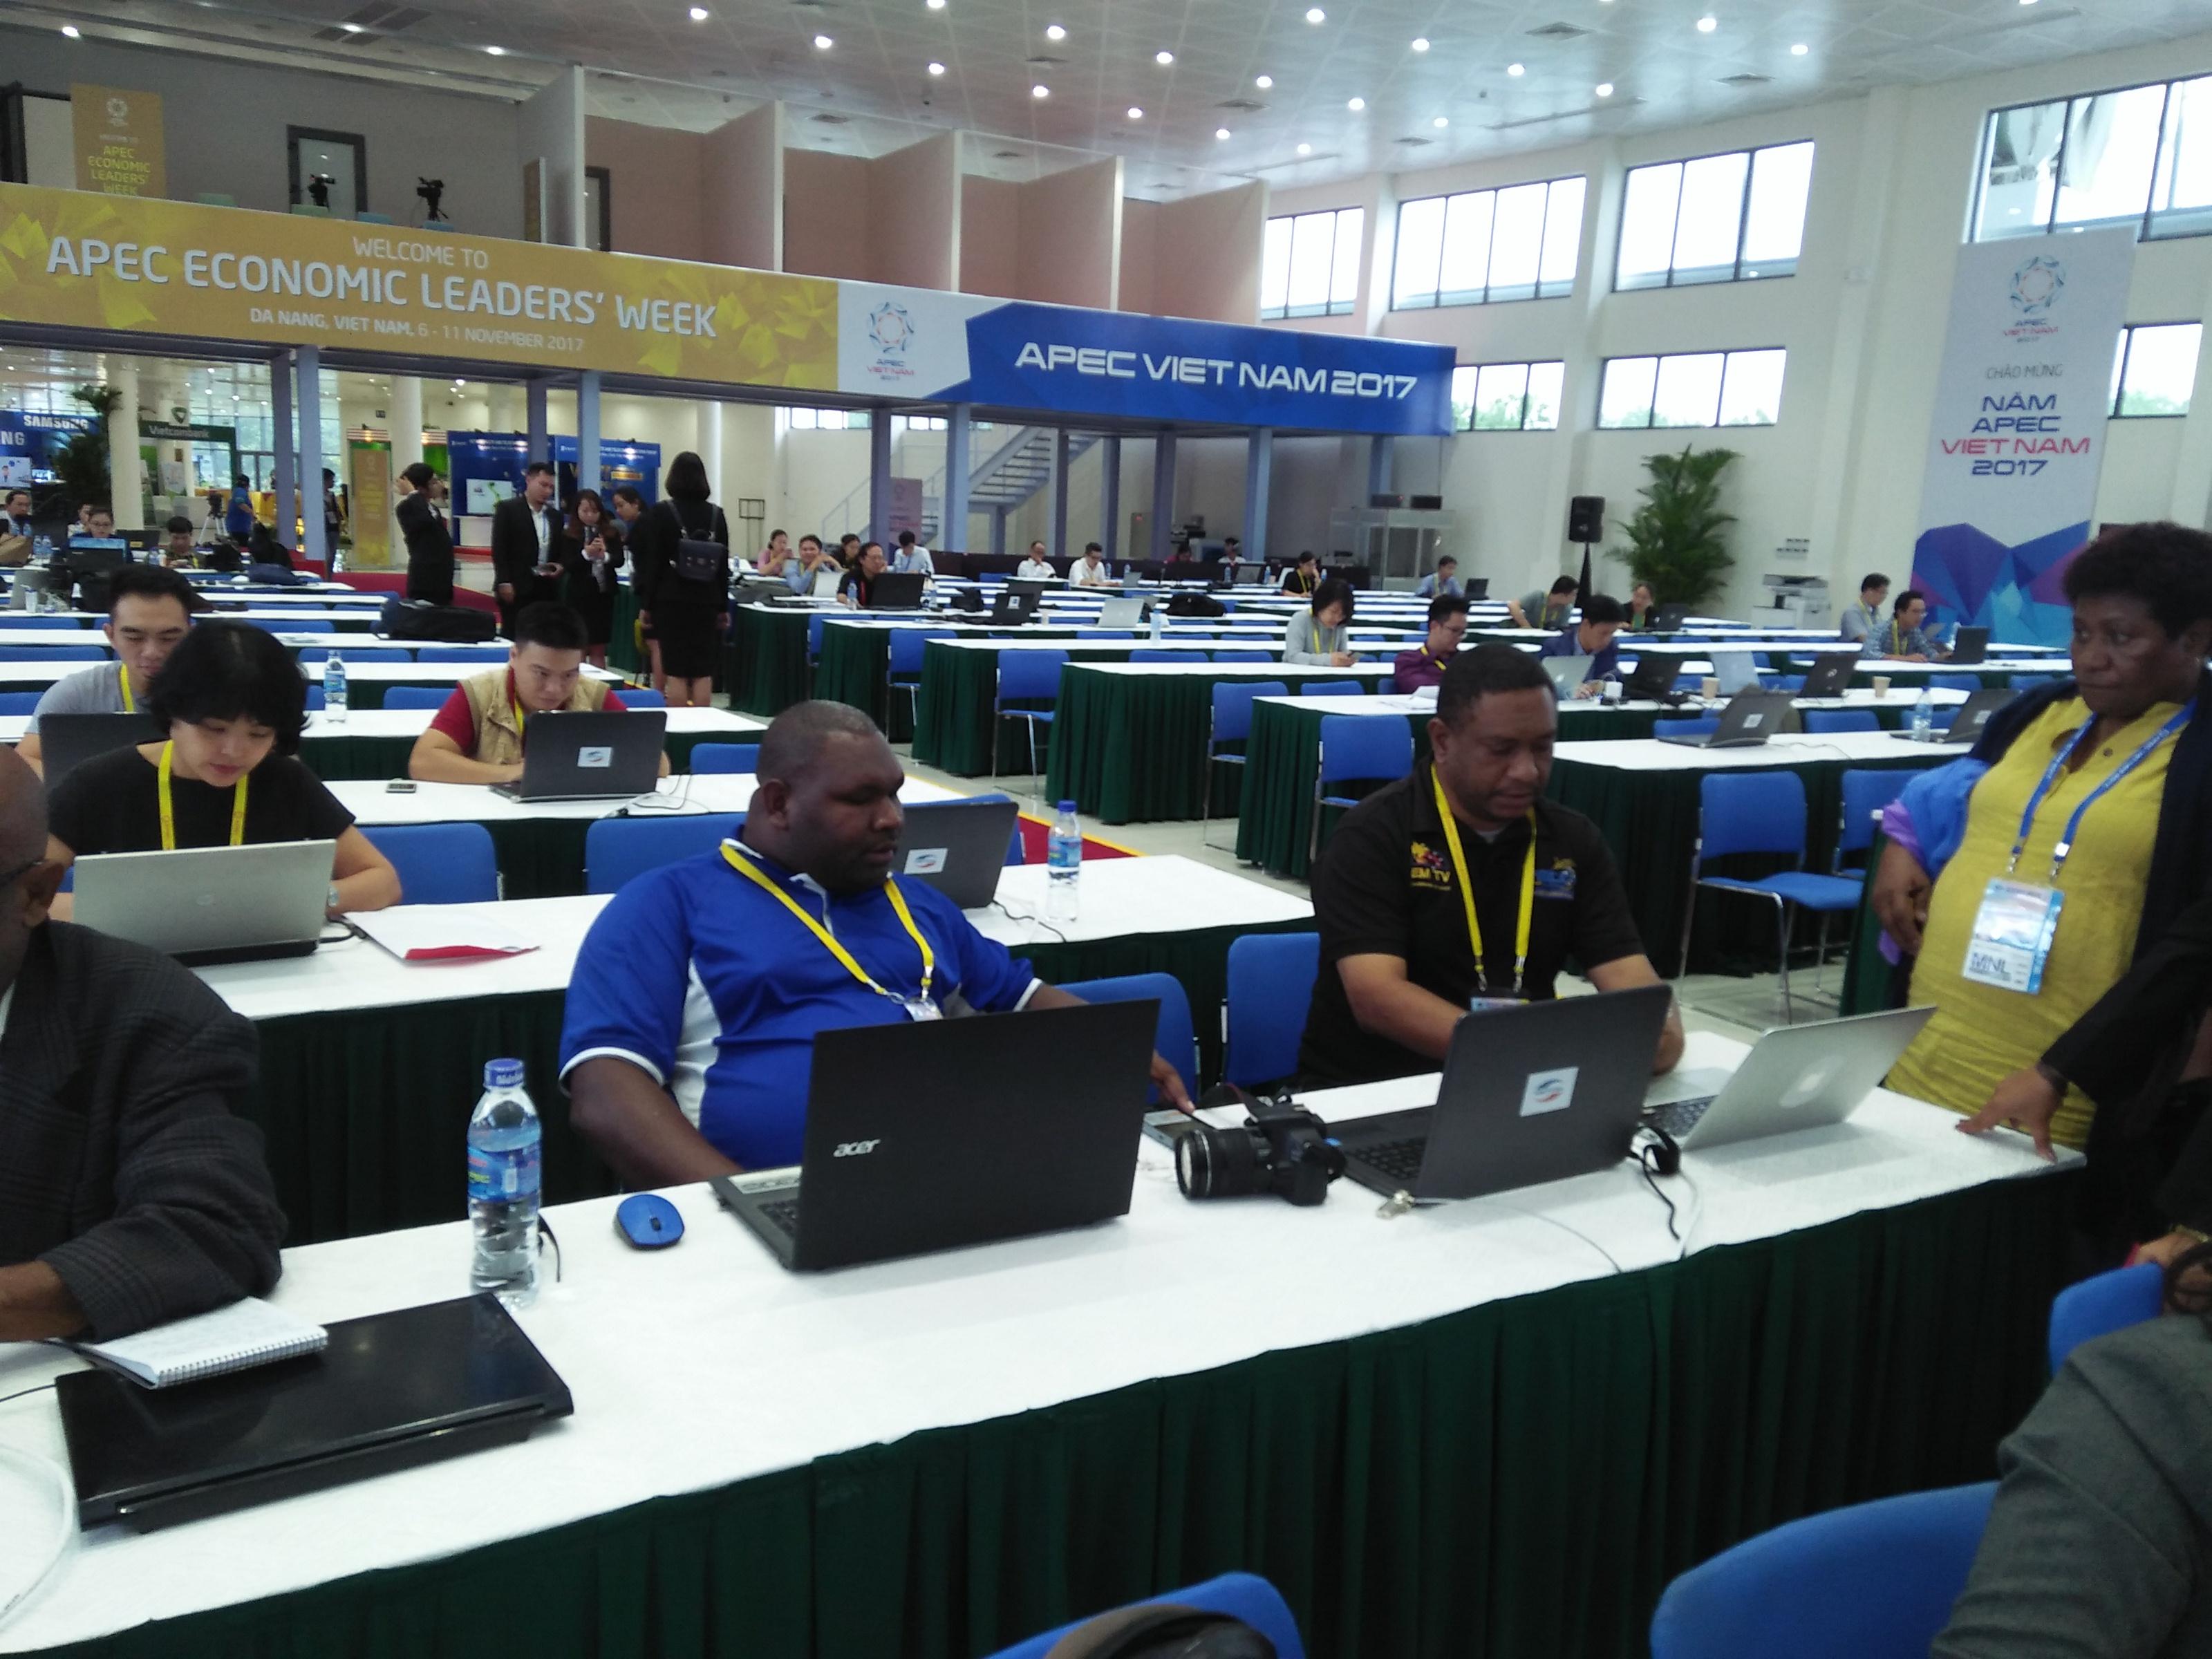 APEC media centre in full swing